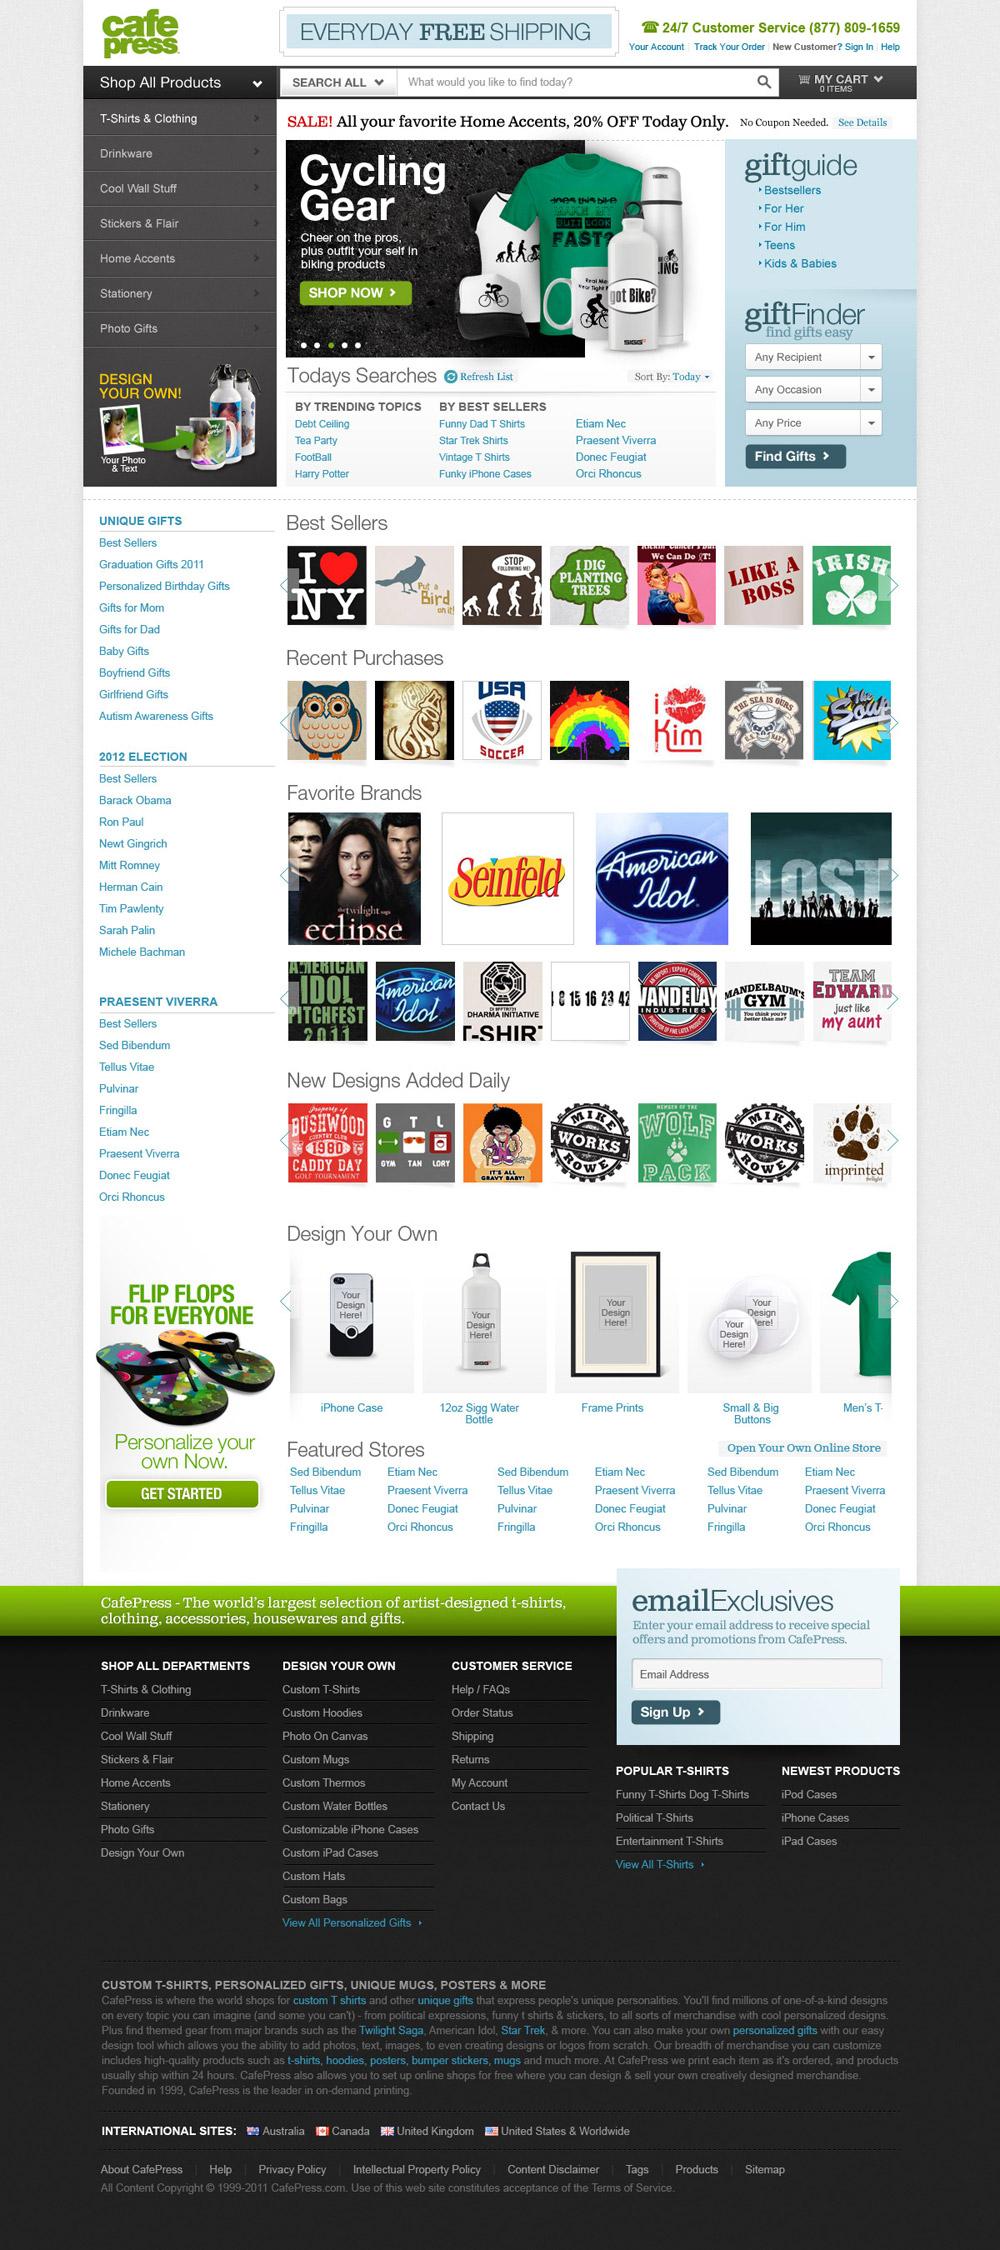 Design your own t-shirt cafepress - Cafepress